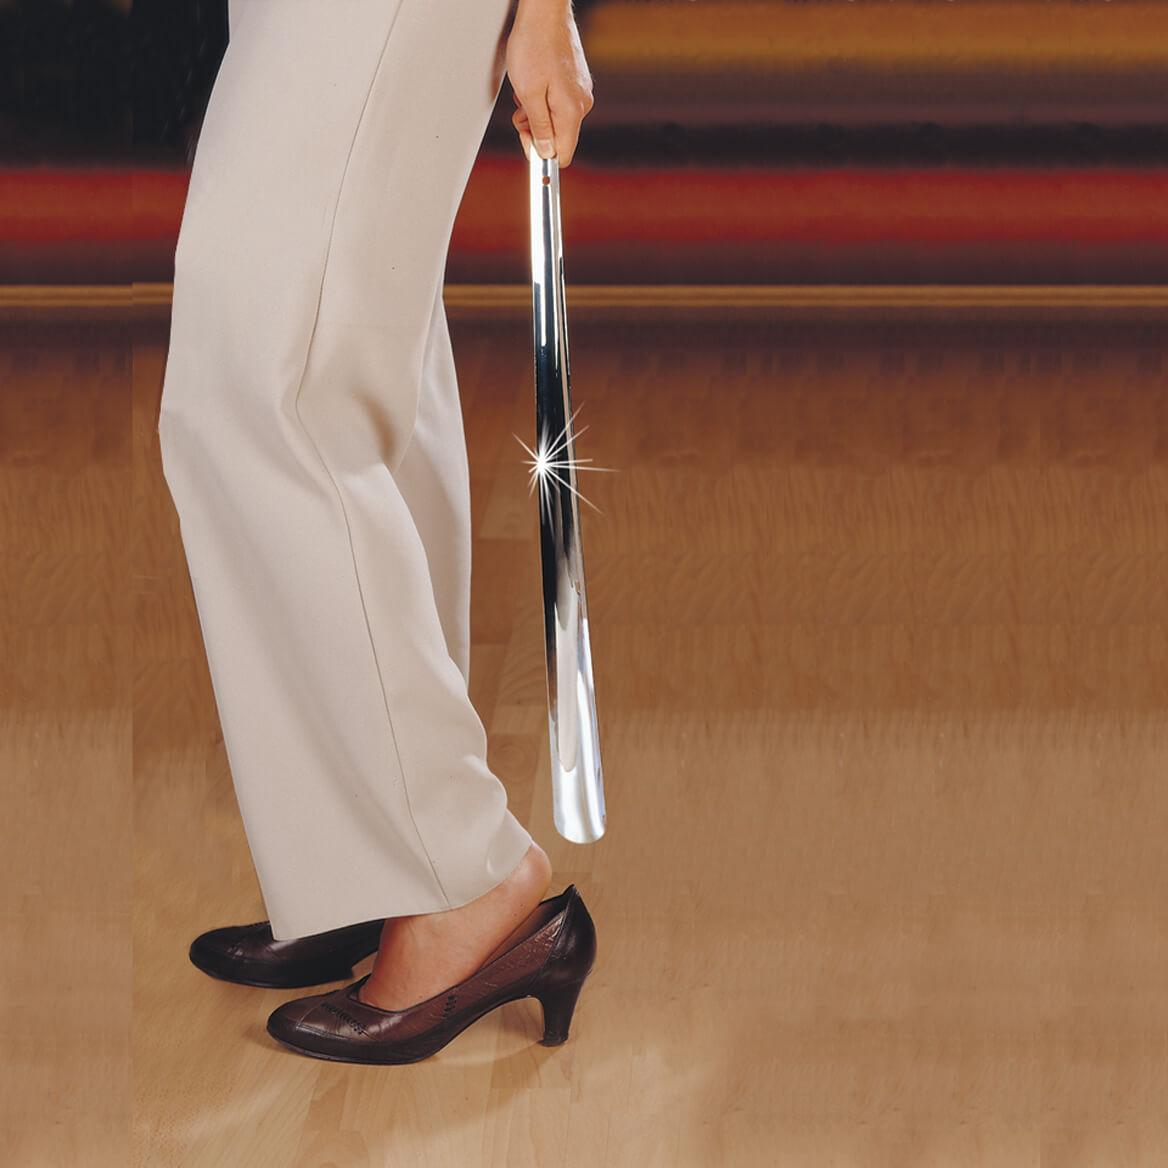 Extra Long Shoe Horn-310268